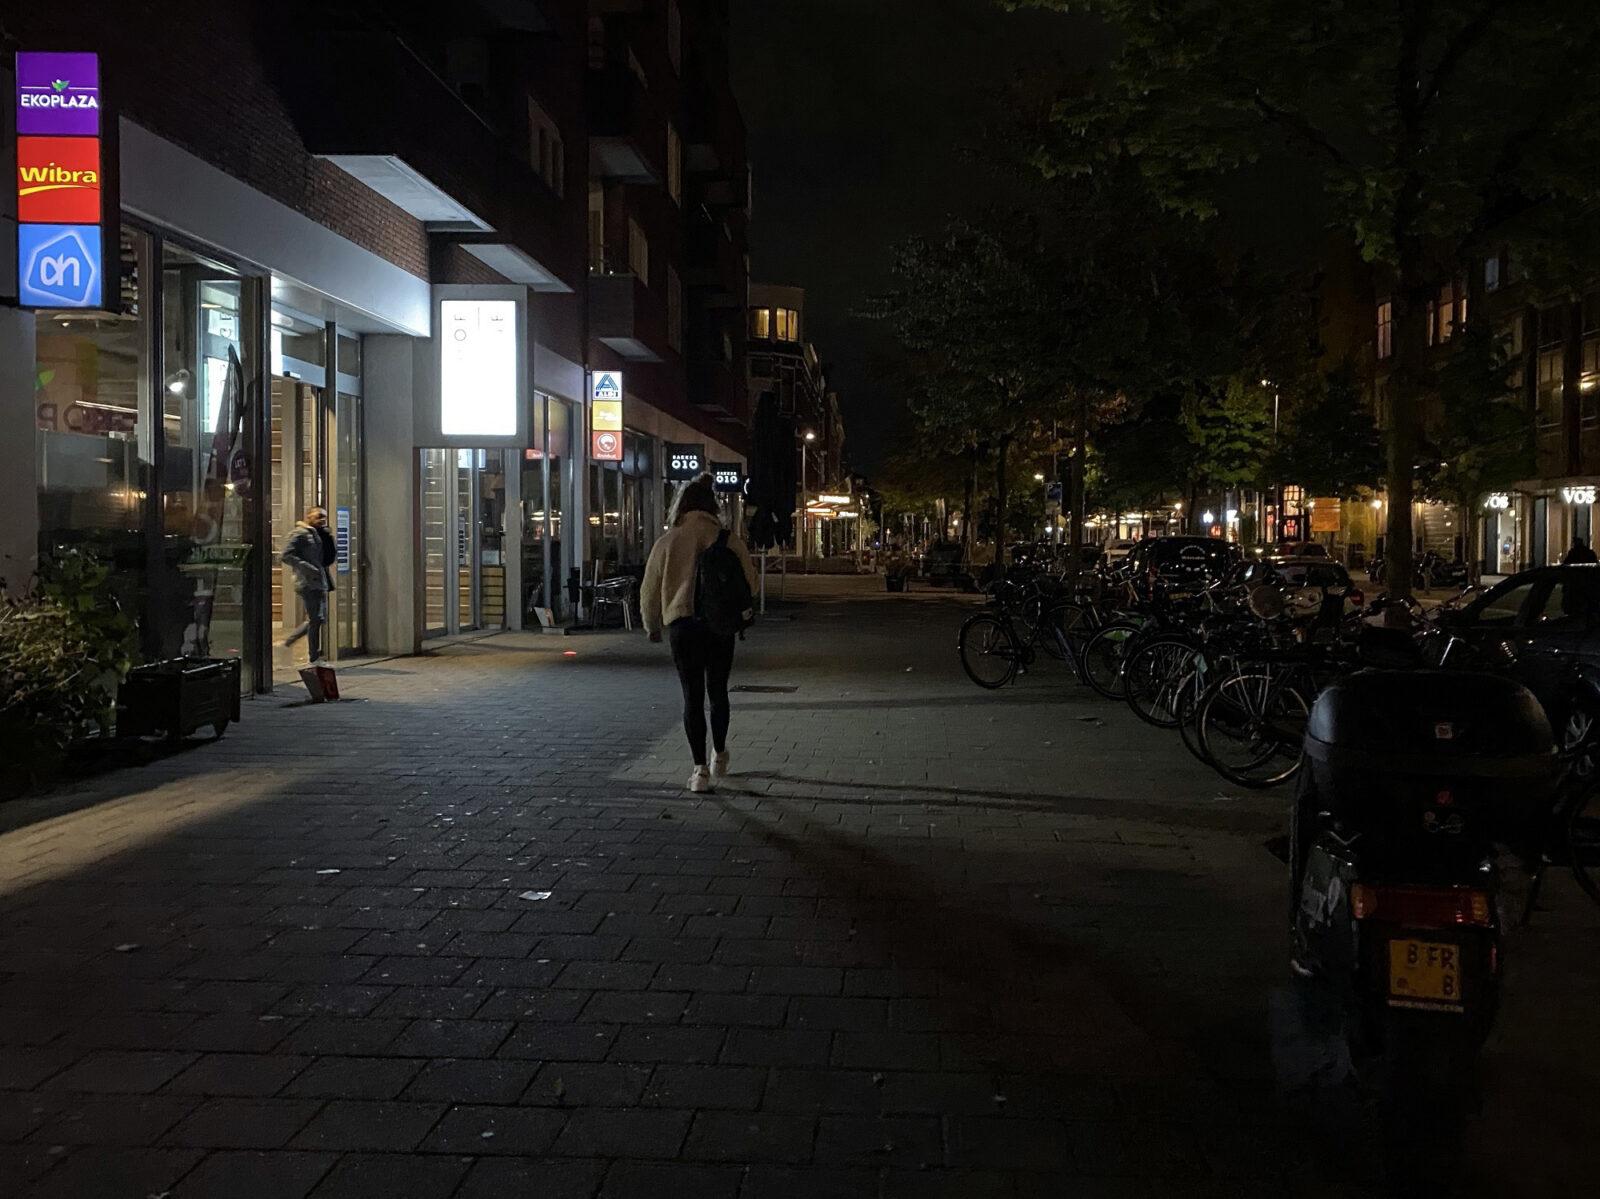 Kralingen avond 7 lusthofstraat studenten – Sanne van der Most